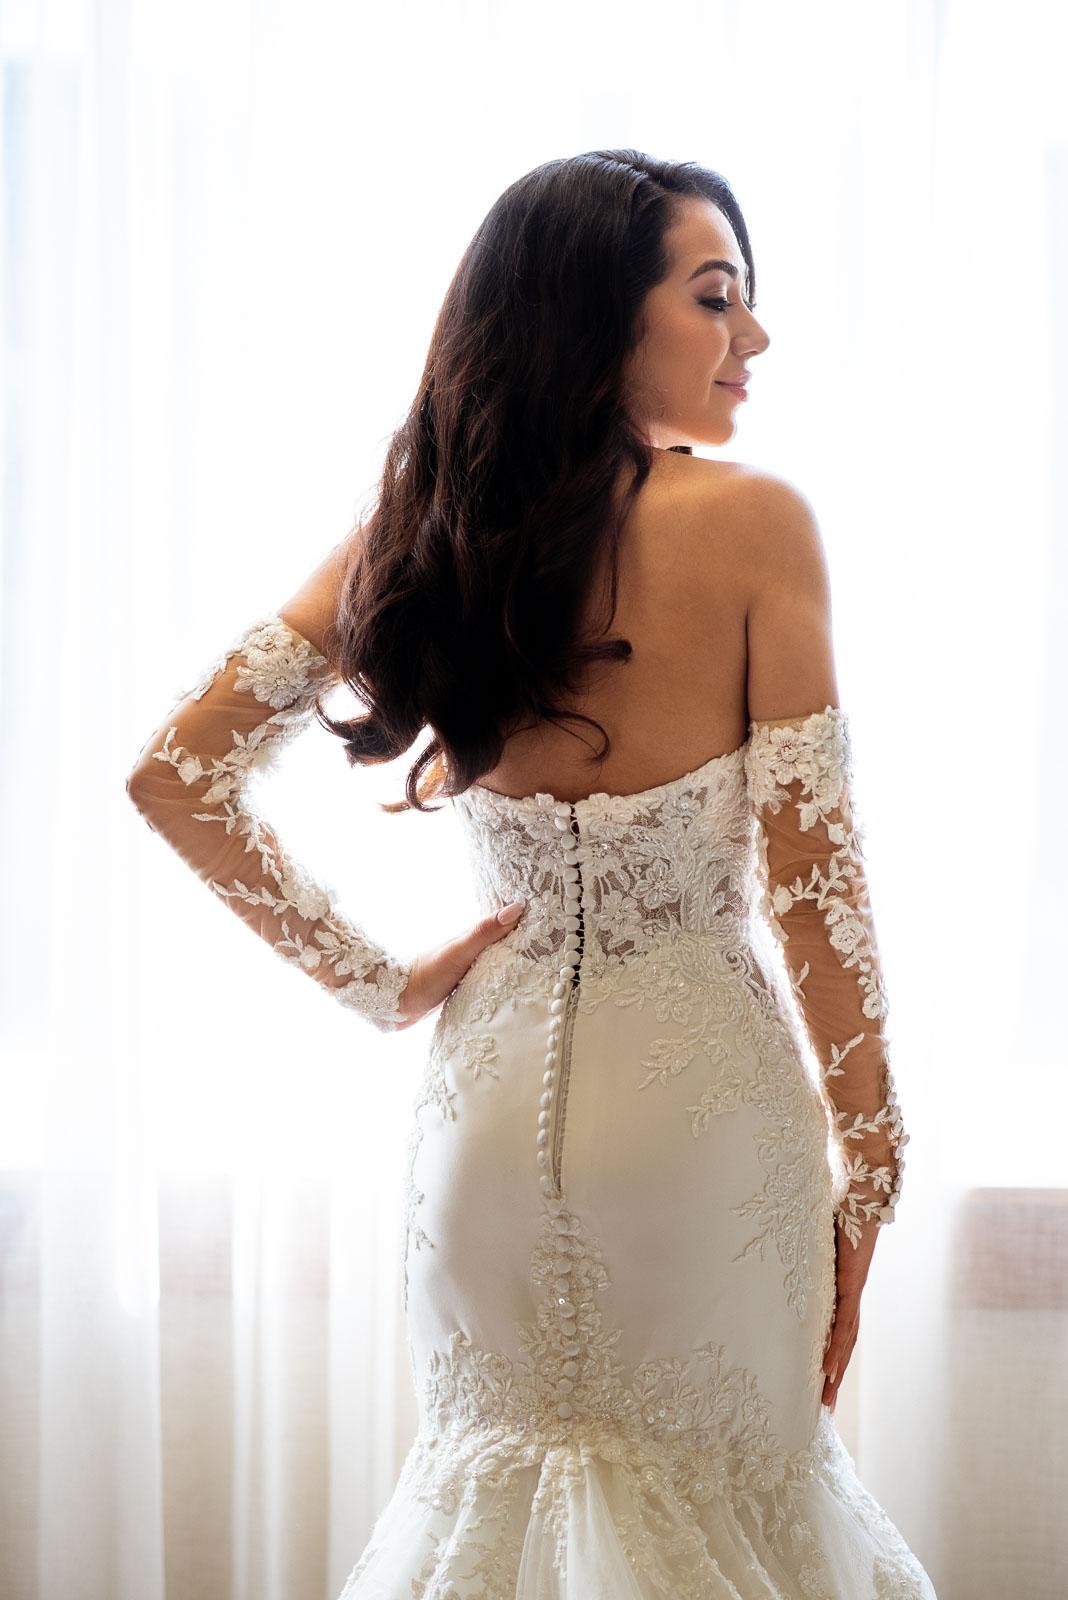 Getting Ready Wedding Photos Wedding Dress | Josie V Photography